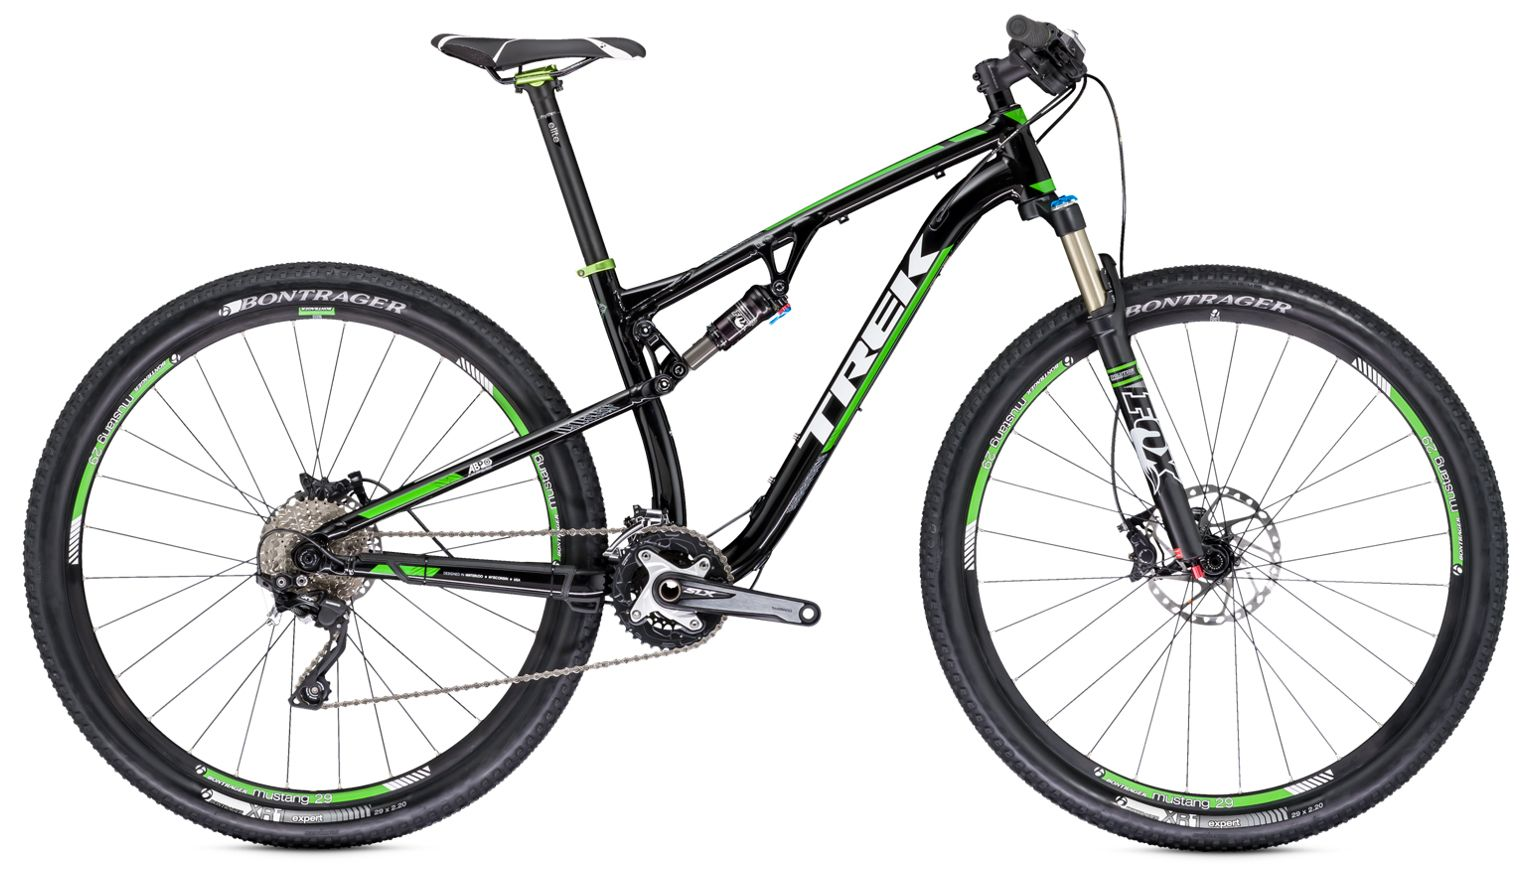 Велосипед Trek Superfly FS 8 2014,  Горные  - артикул:284044